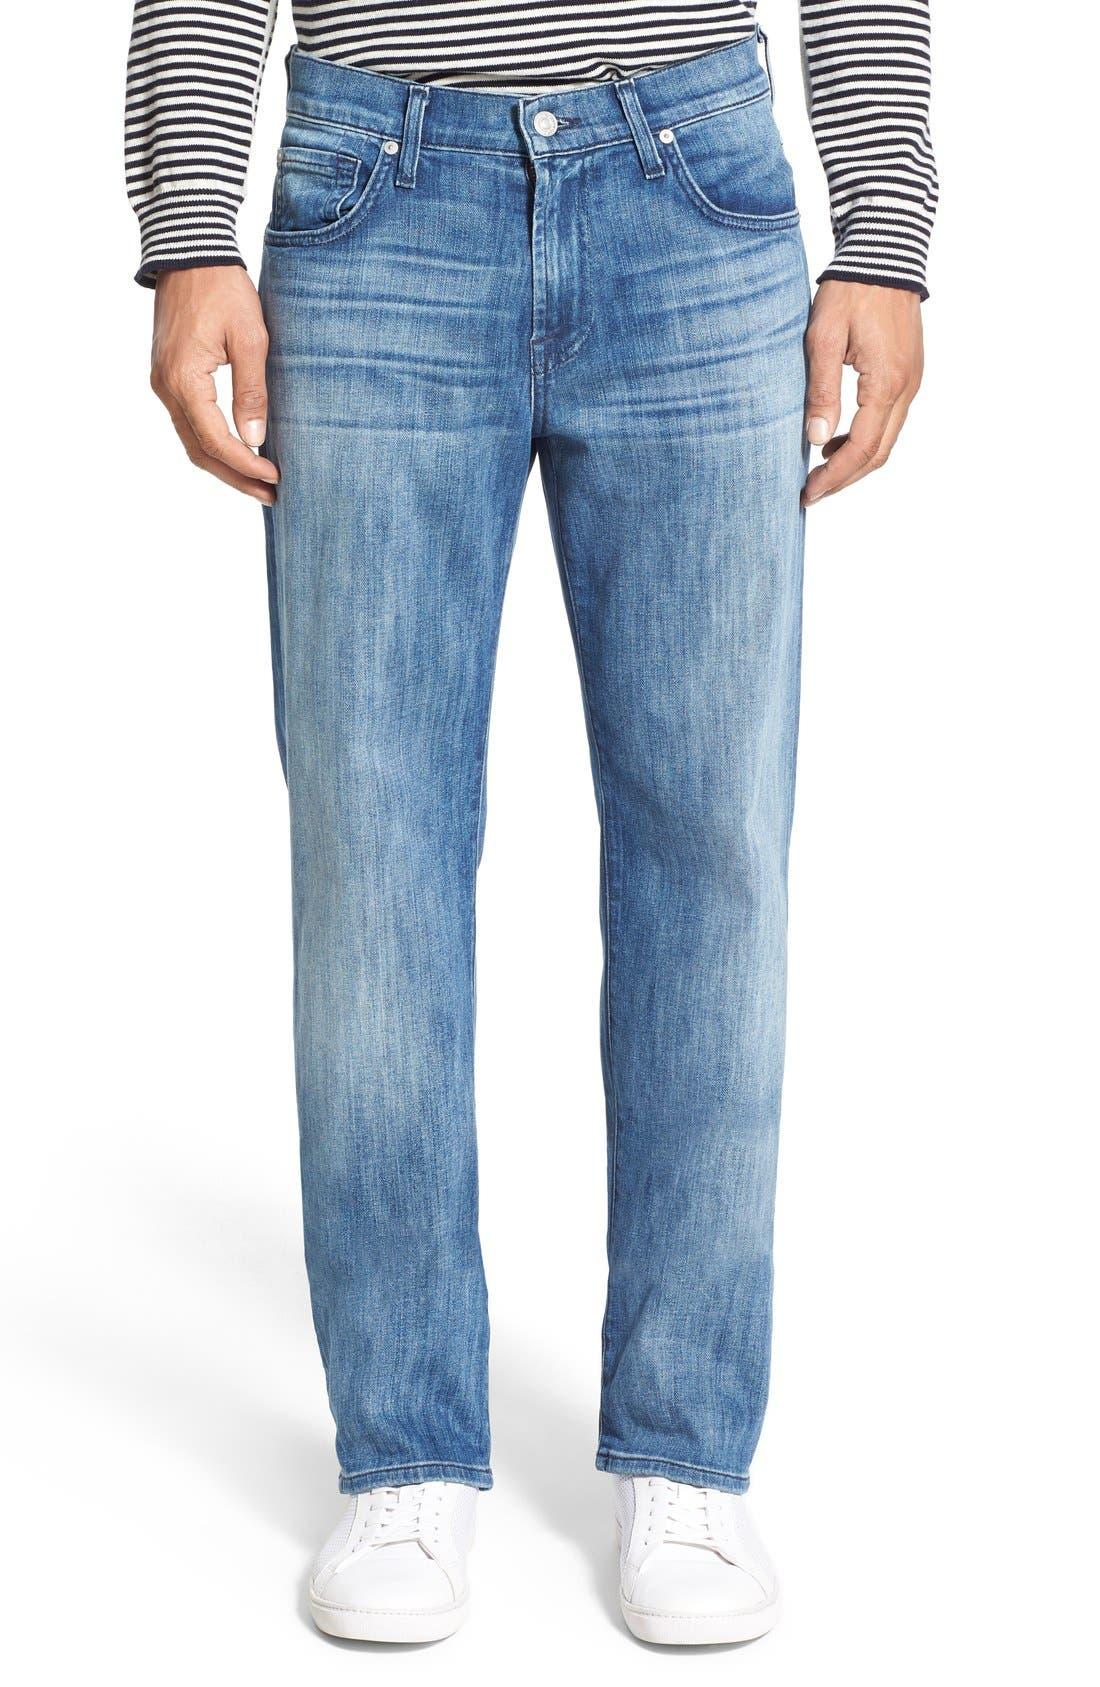 Luxe Performance - Austyn Relaxed Straight Leg Jeans,                         Main,                         color, Nakkitta Blue